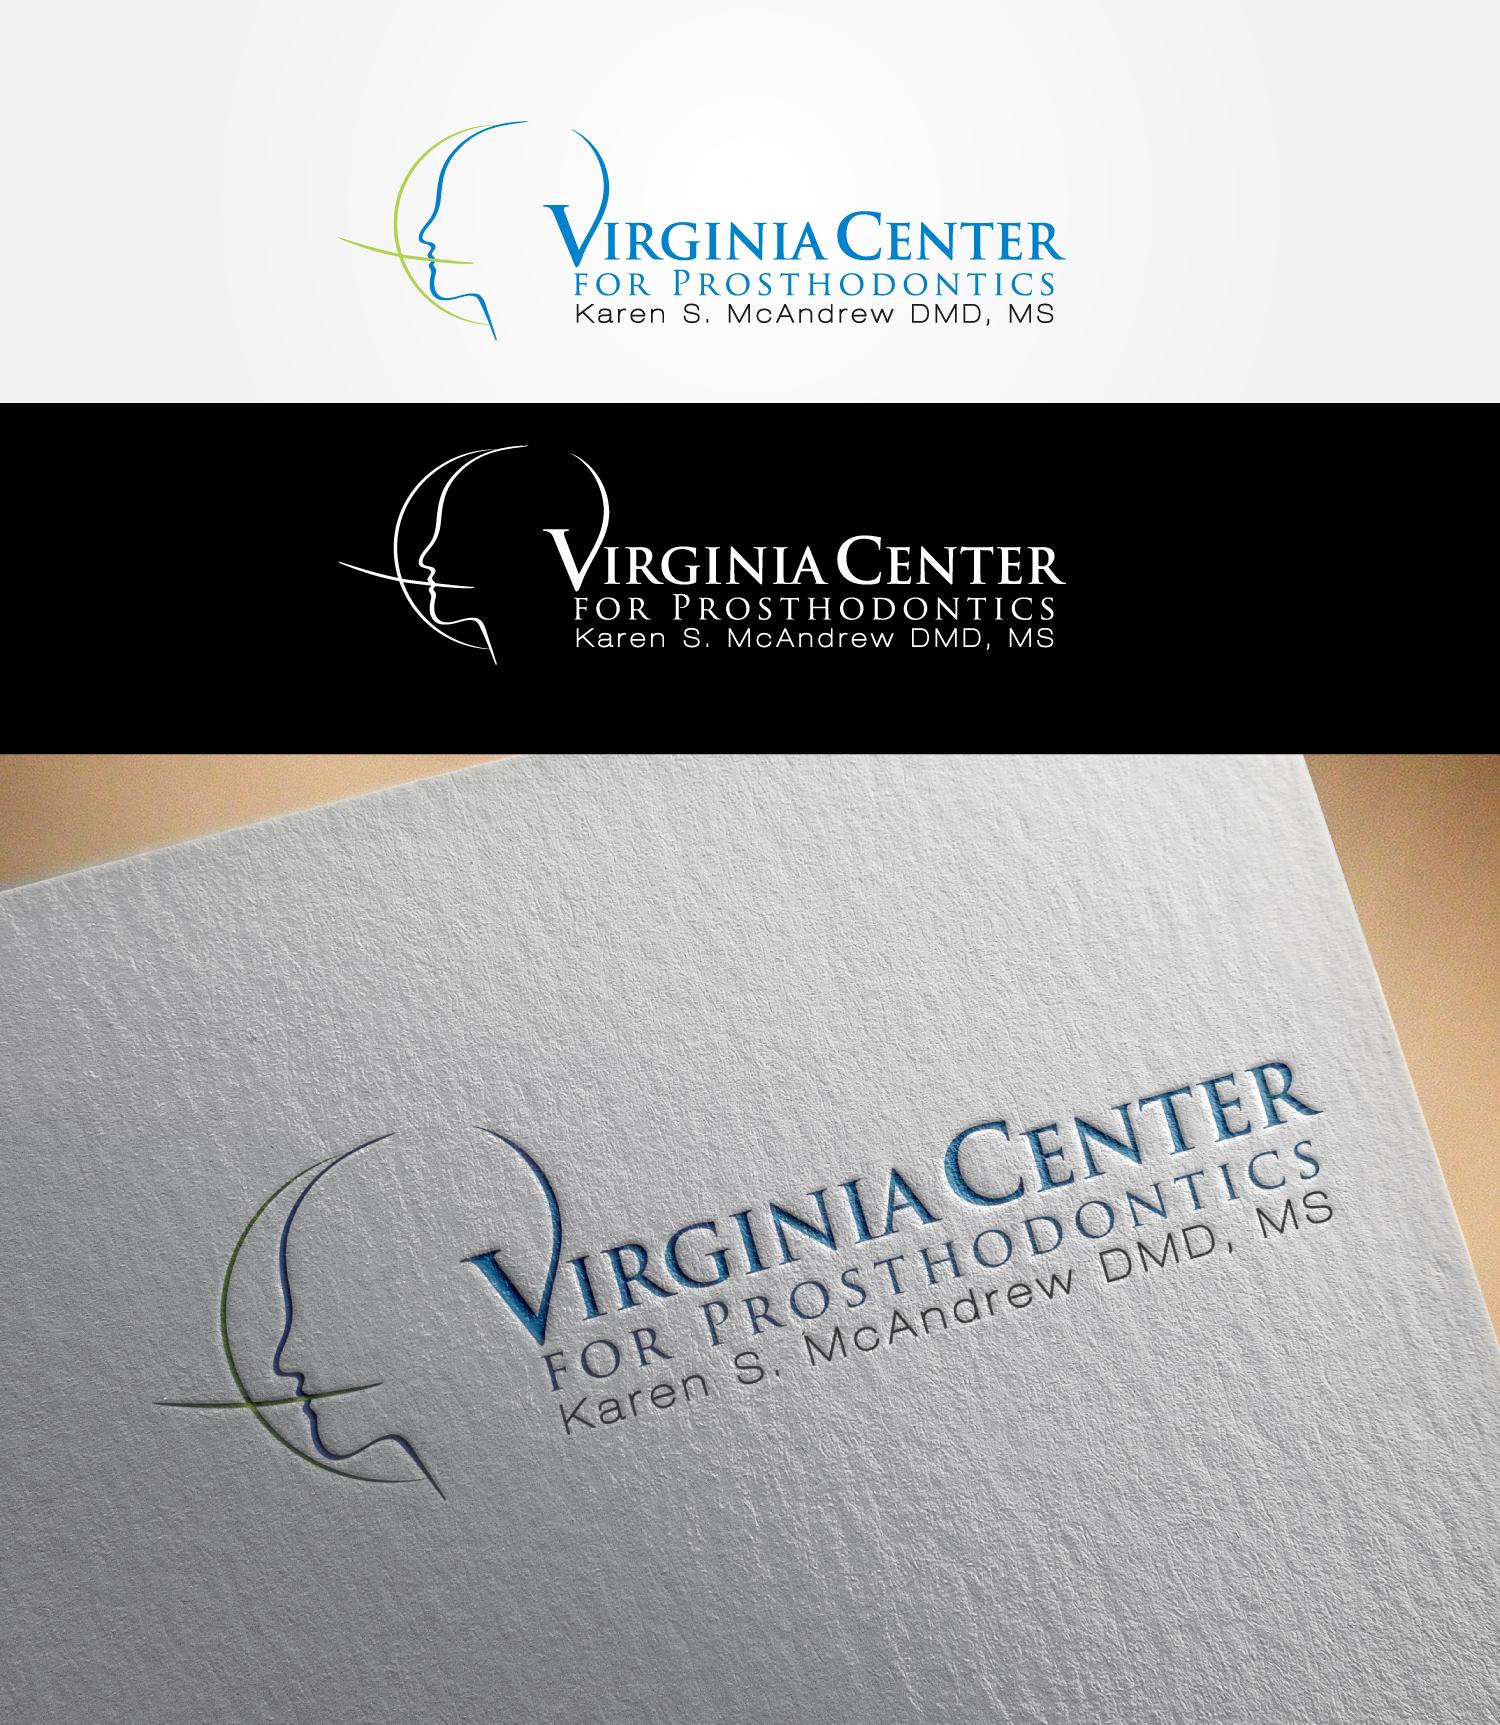 Logo Design by MD SHOHIDUL ISLAM - Entry No. 18 in the Logo Design Contest Imaginative Logo Design for Virginia Center for Prosthodontics.